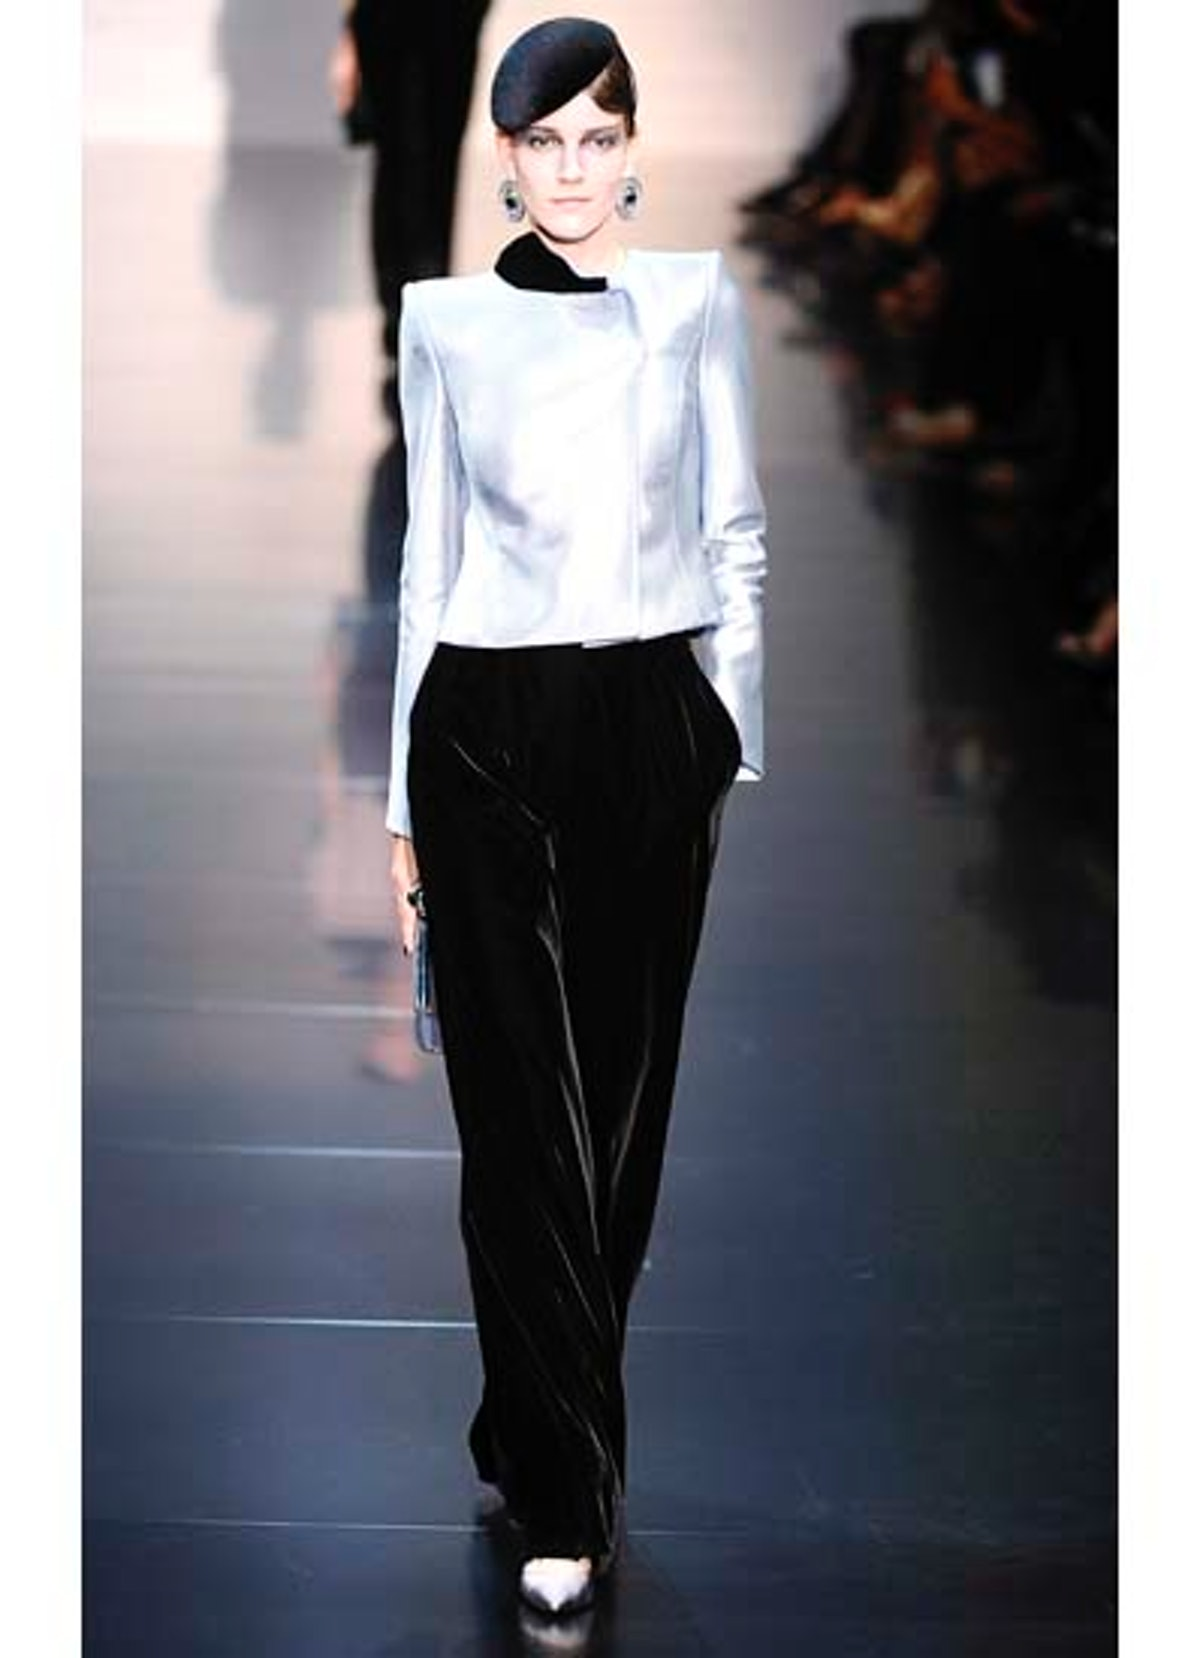 fass-giorgio-armani-couture-2012-runway-06-v.jpg